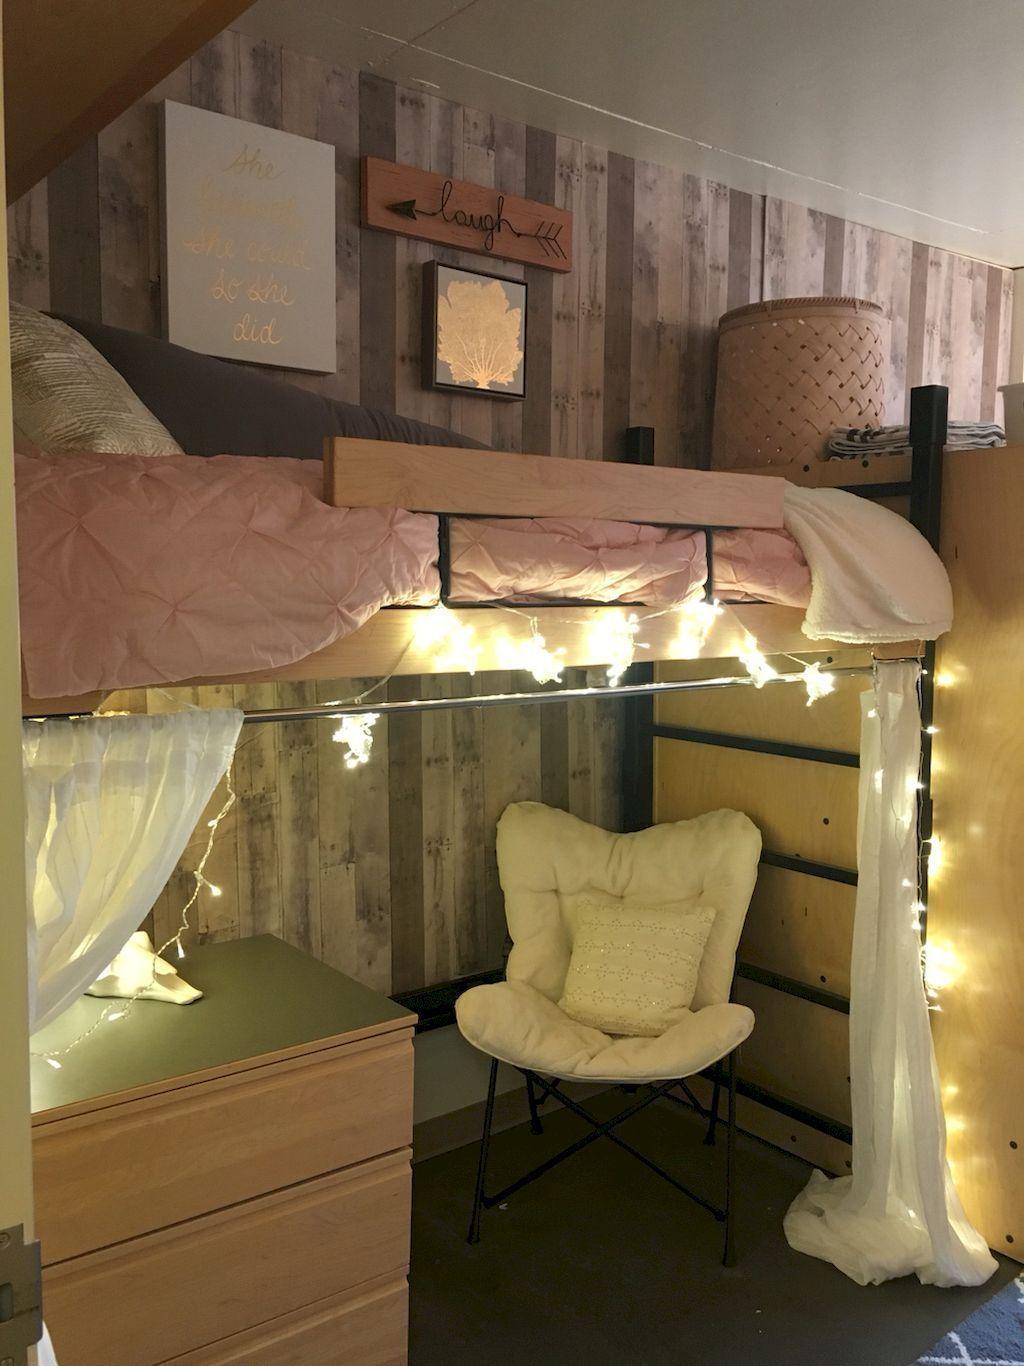 Ikea Dorm Room Ideas: İkea Oyuncak Dolabı ????♀️ #girldorms In 2020